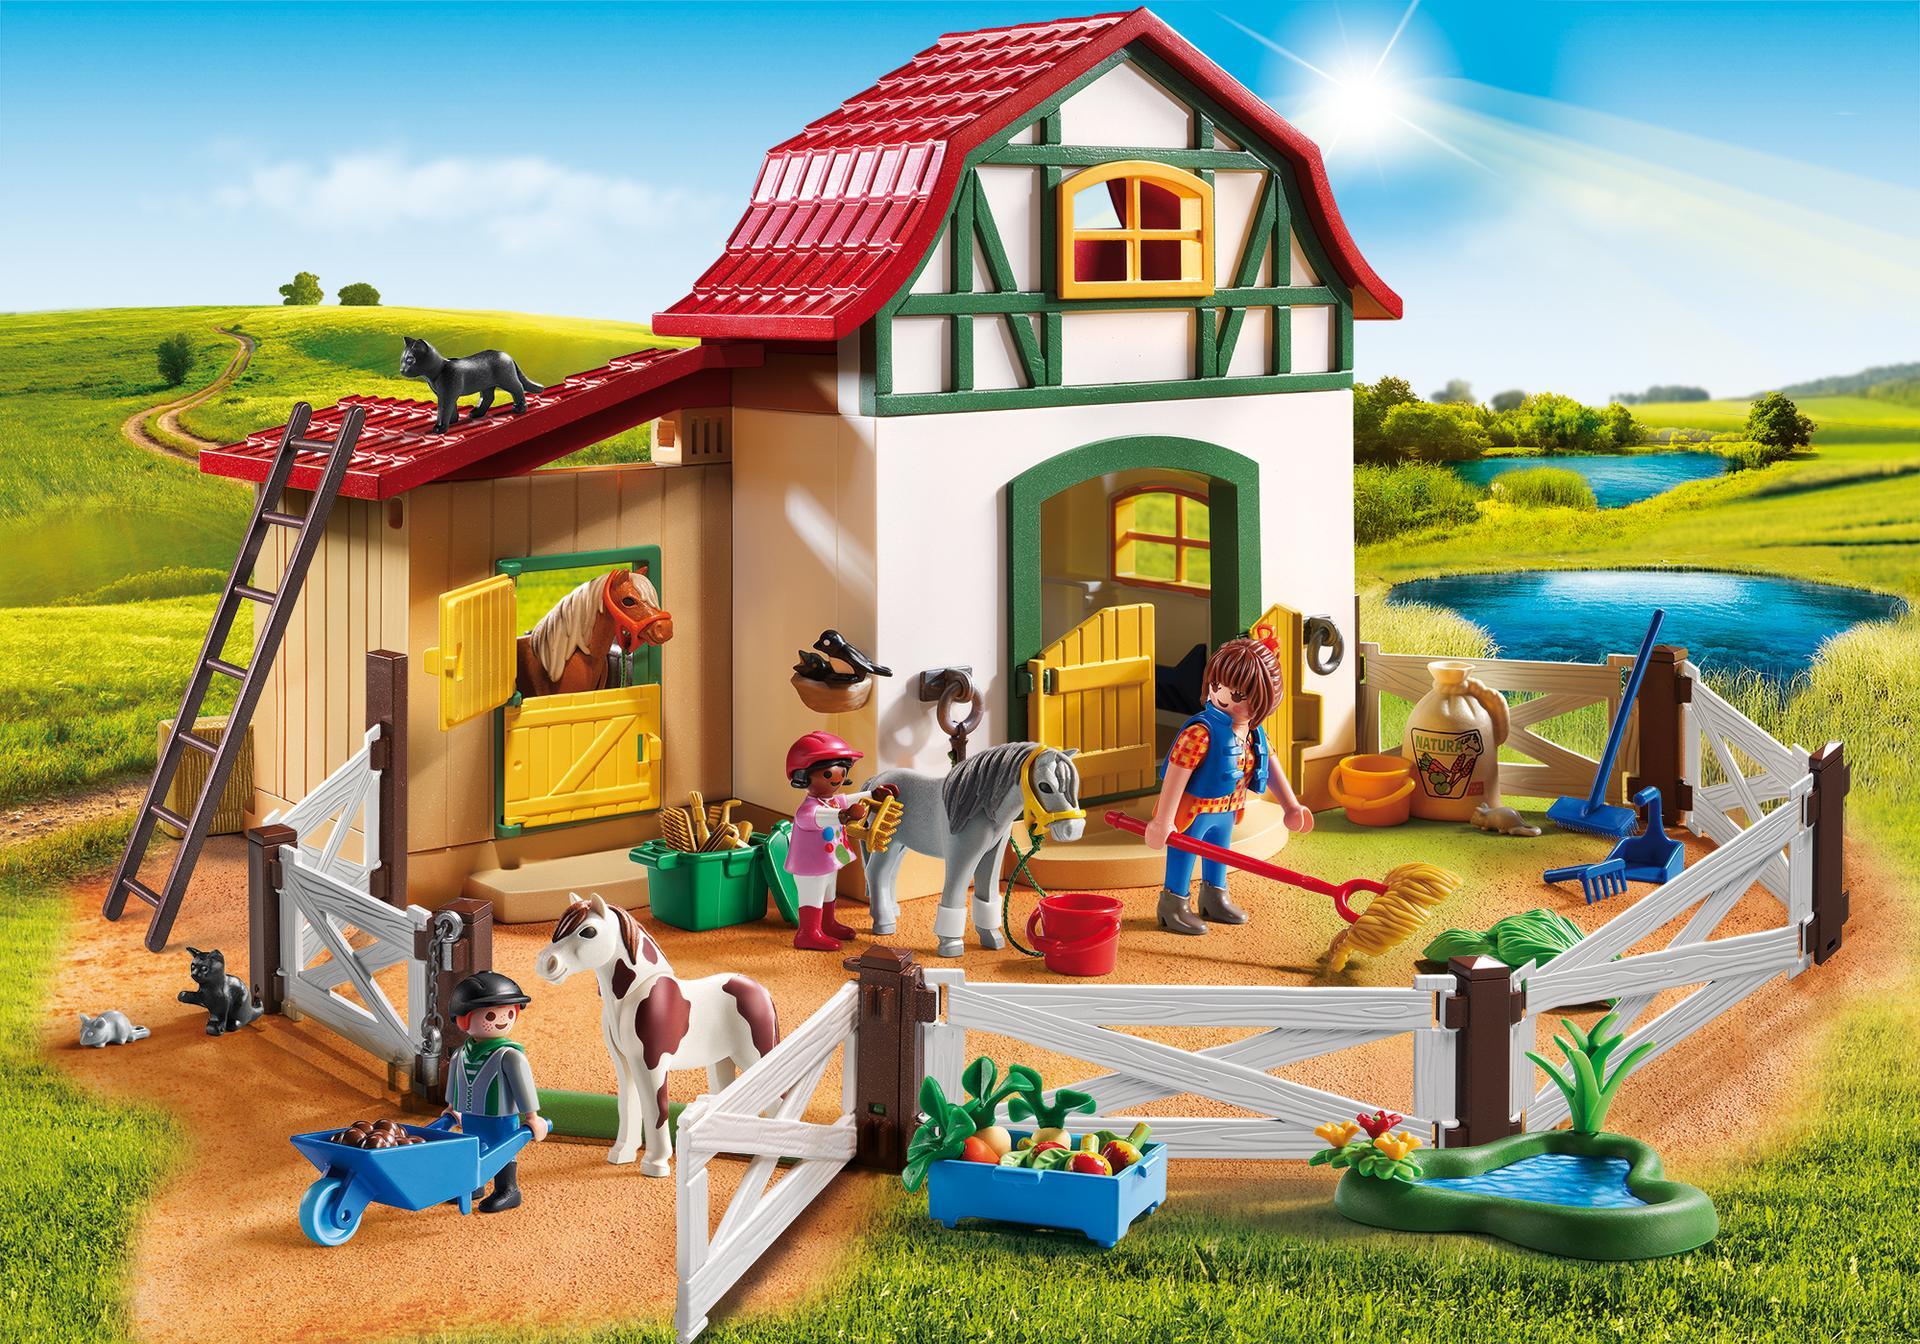 Pony farm 6927 playmobil united kingdom - Pferde playmobil ...